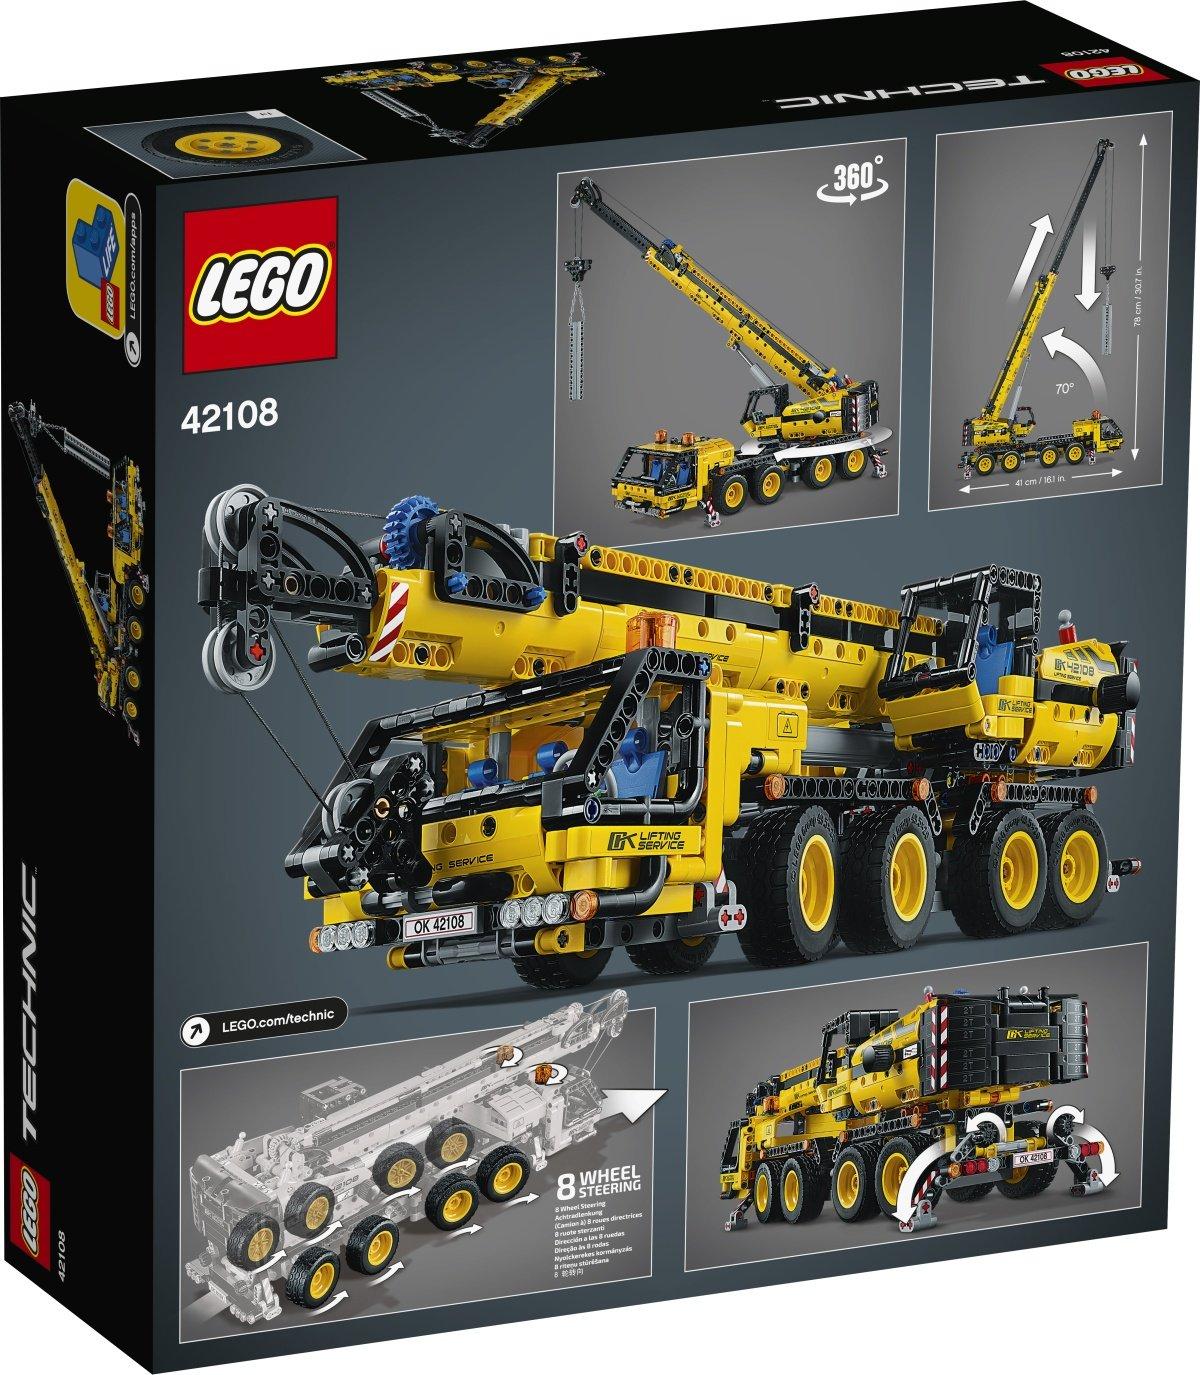 lego-technic-42108-kran-lkw-2020-box-back zusammengebaut.com